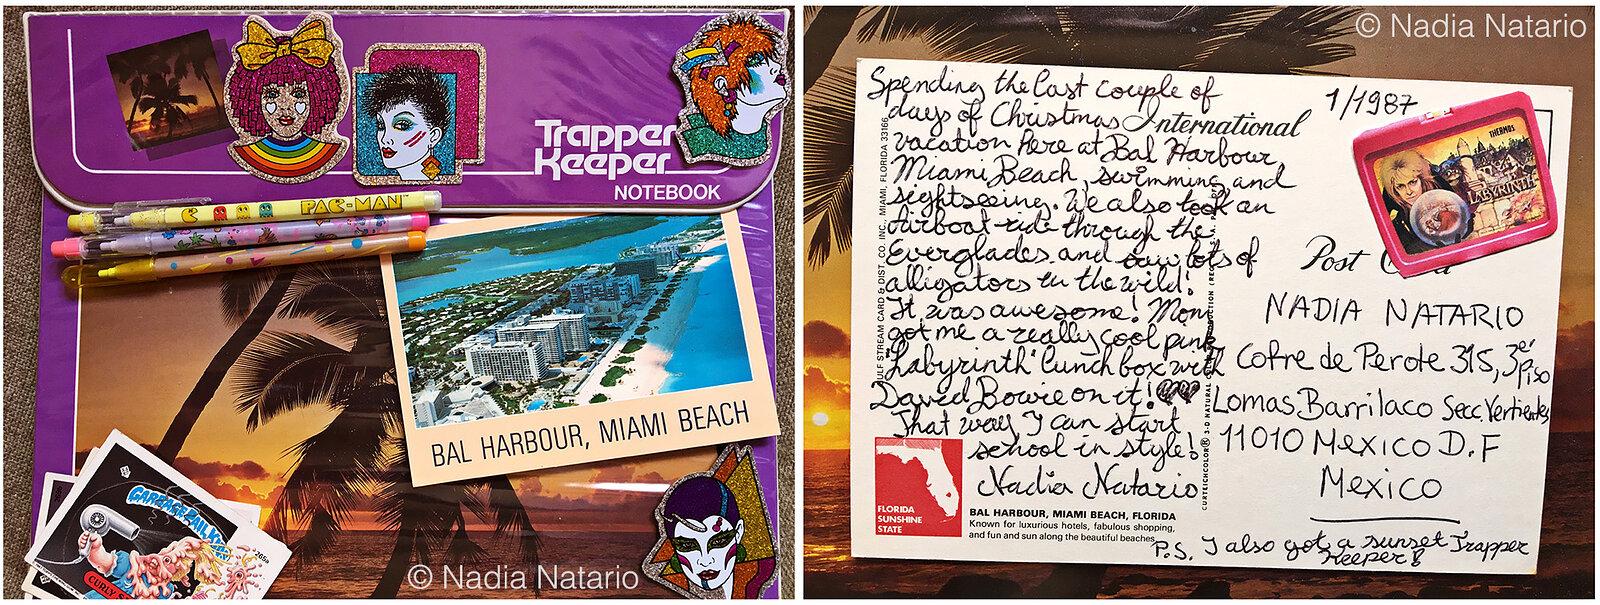 Postcards to Myself - Miami, U.S.A, 1987